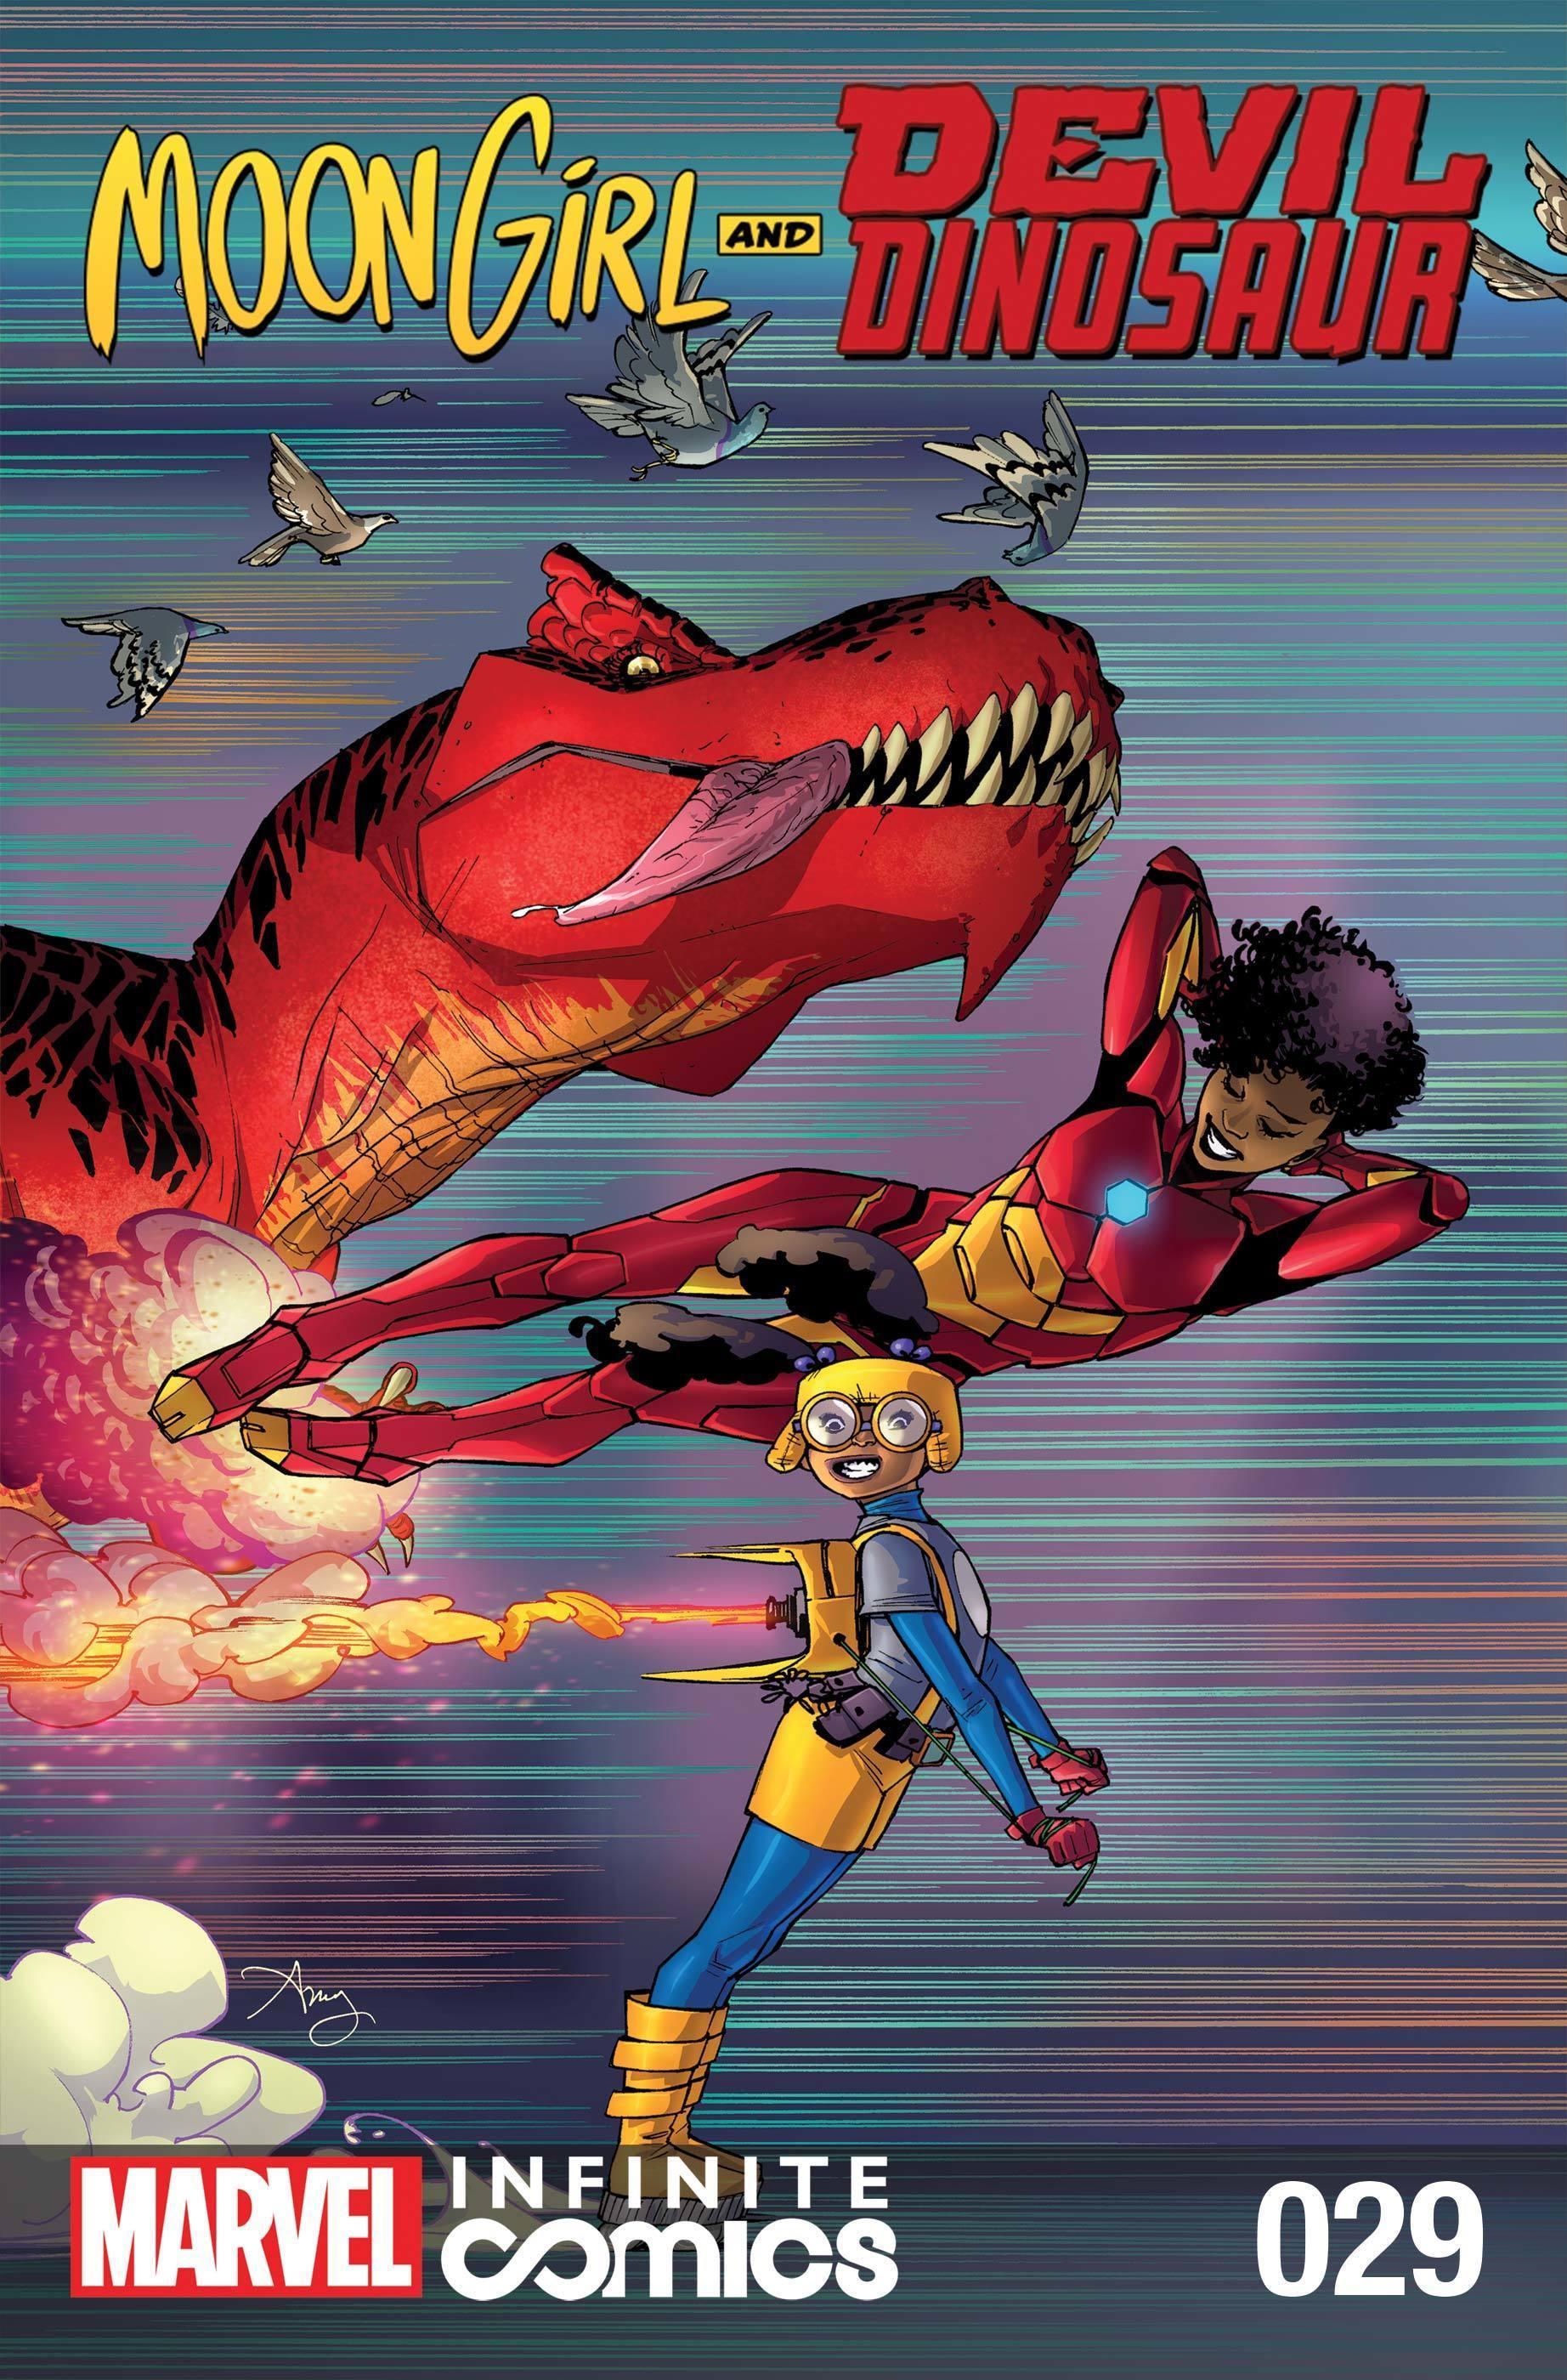 Moon Girl and Devil Dinosaur #29